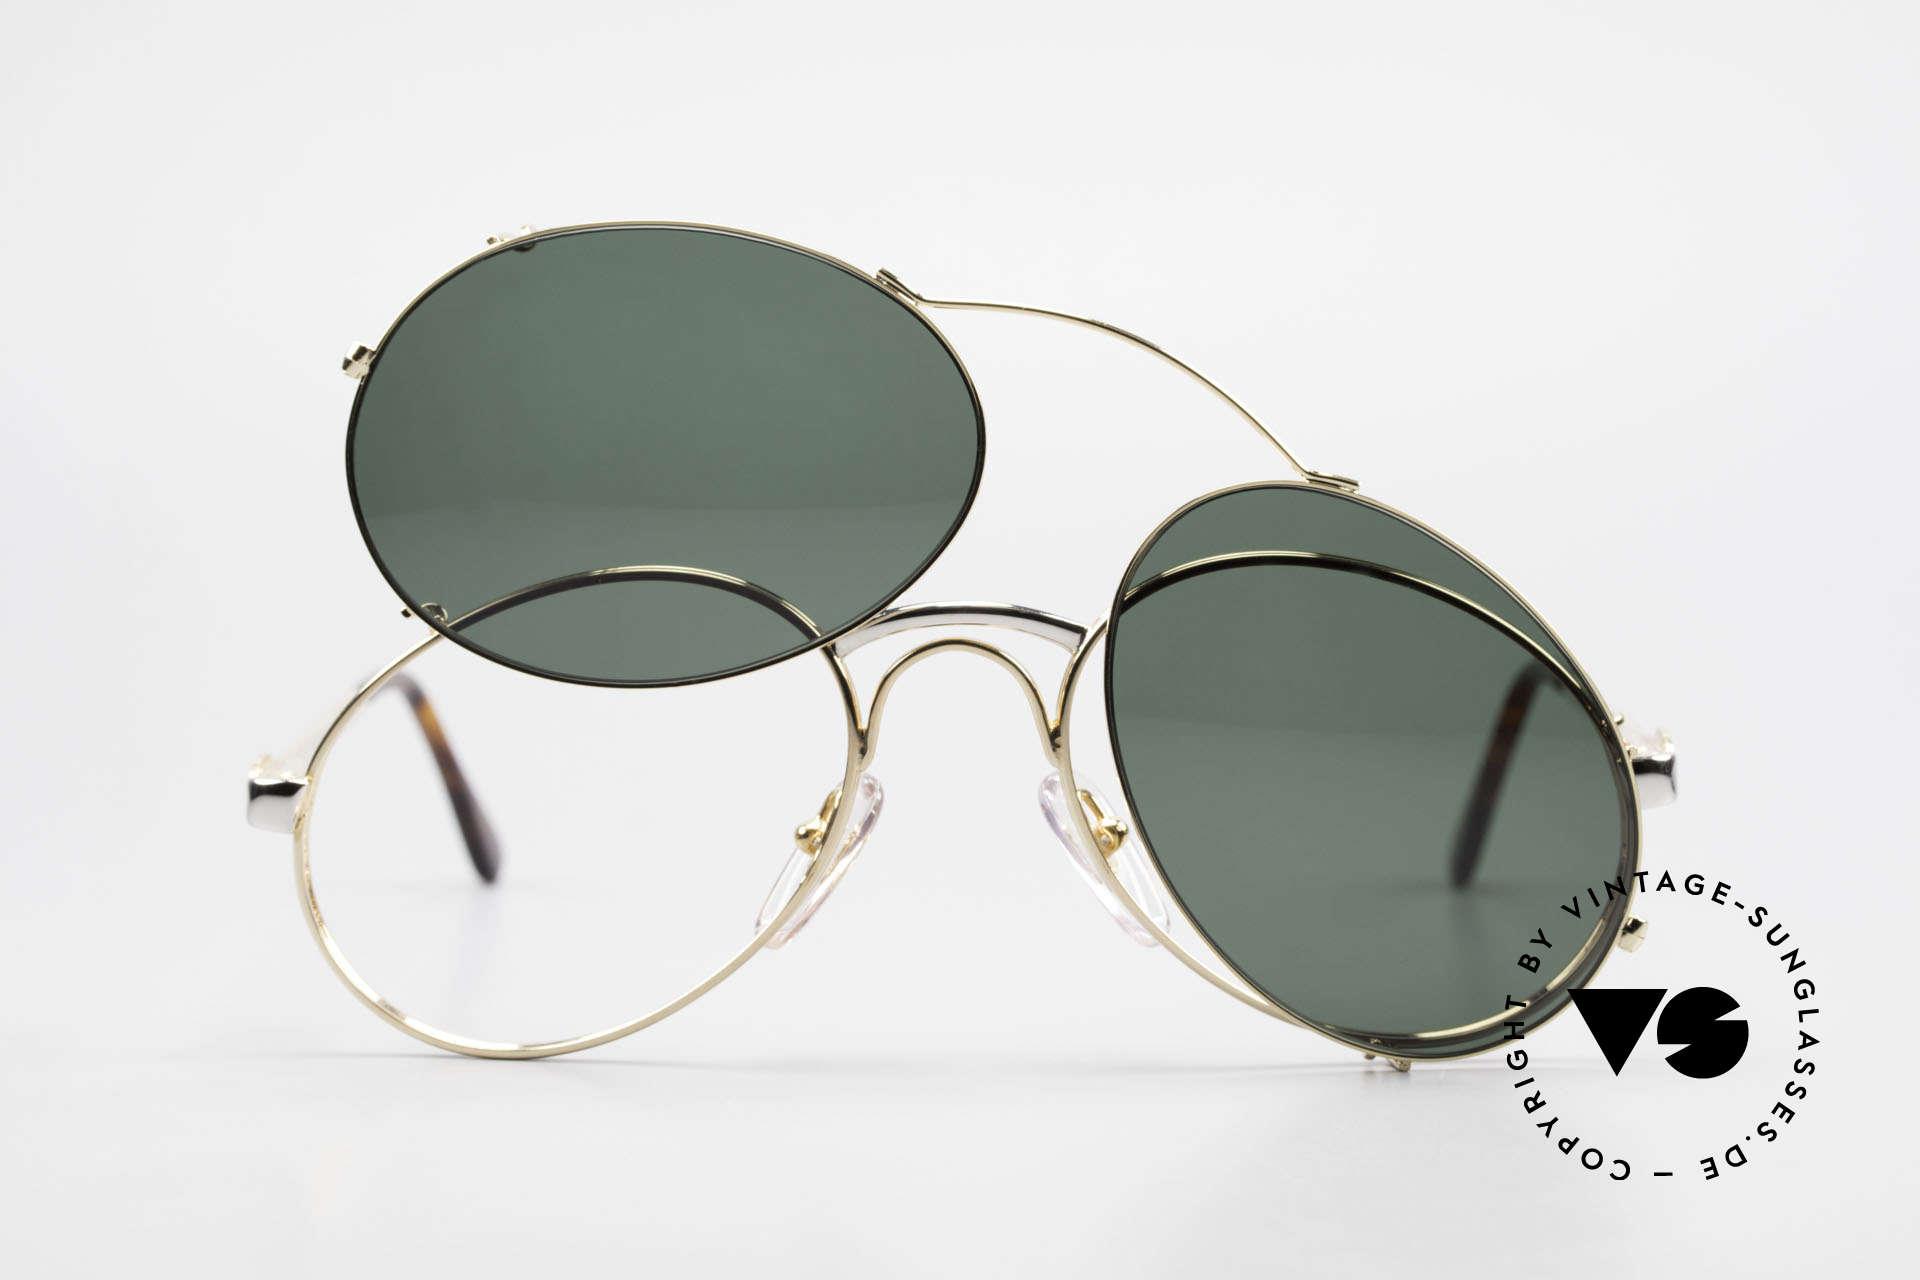 Bugatti 03308 Men's 80's Glasses With Clip On, NO RETRO fashion, but an authentic old 80's original, Made for Men